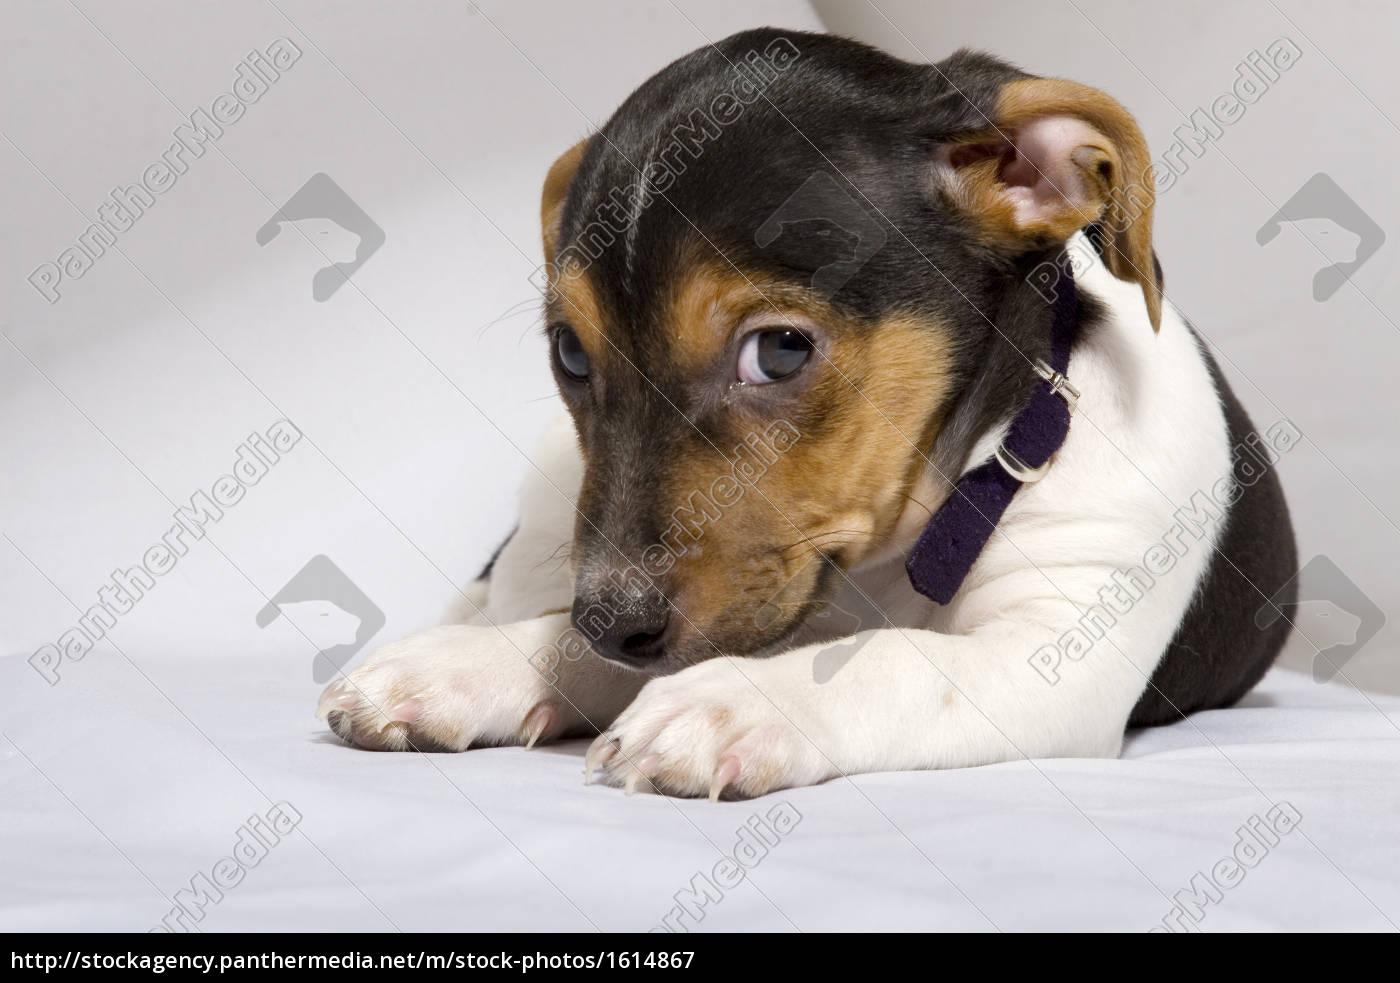 small, dog - 1614867